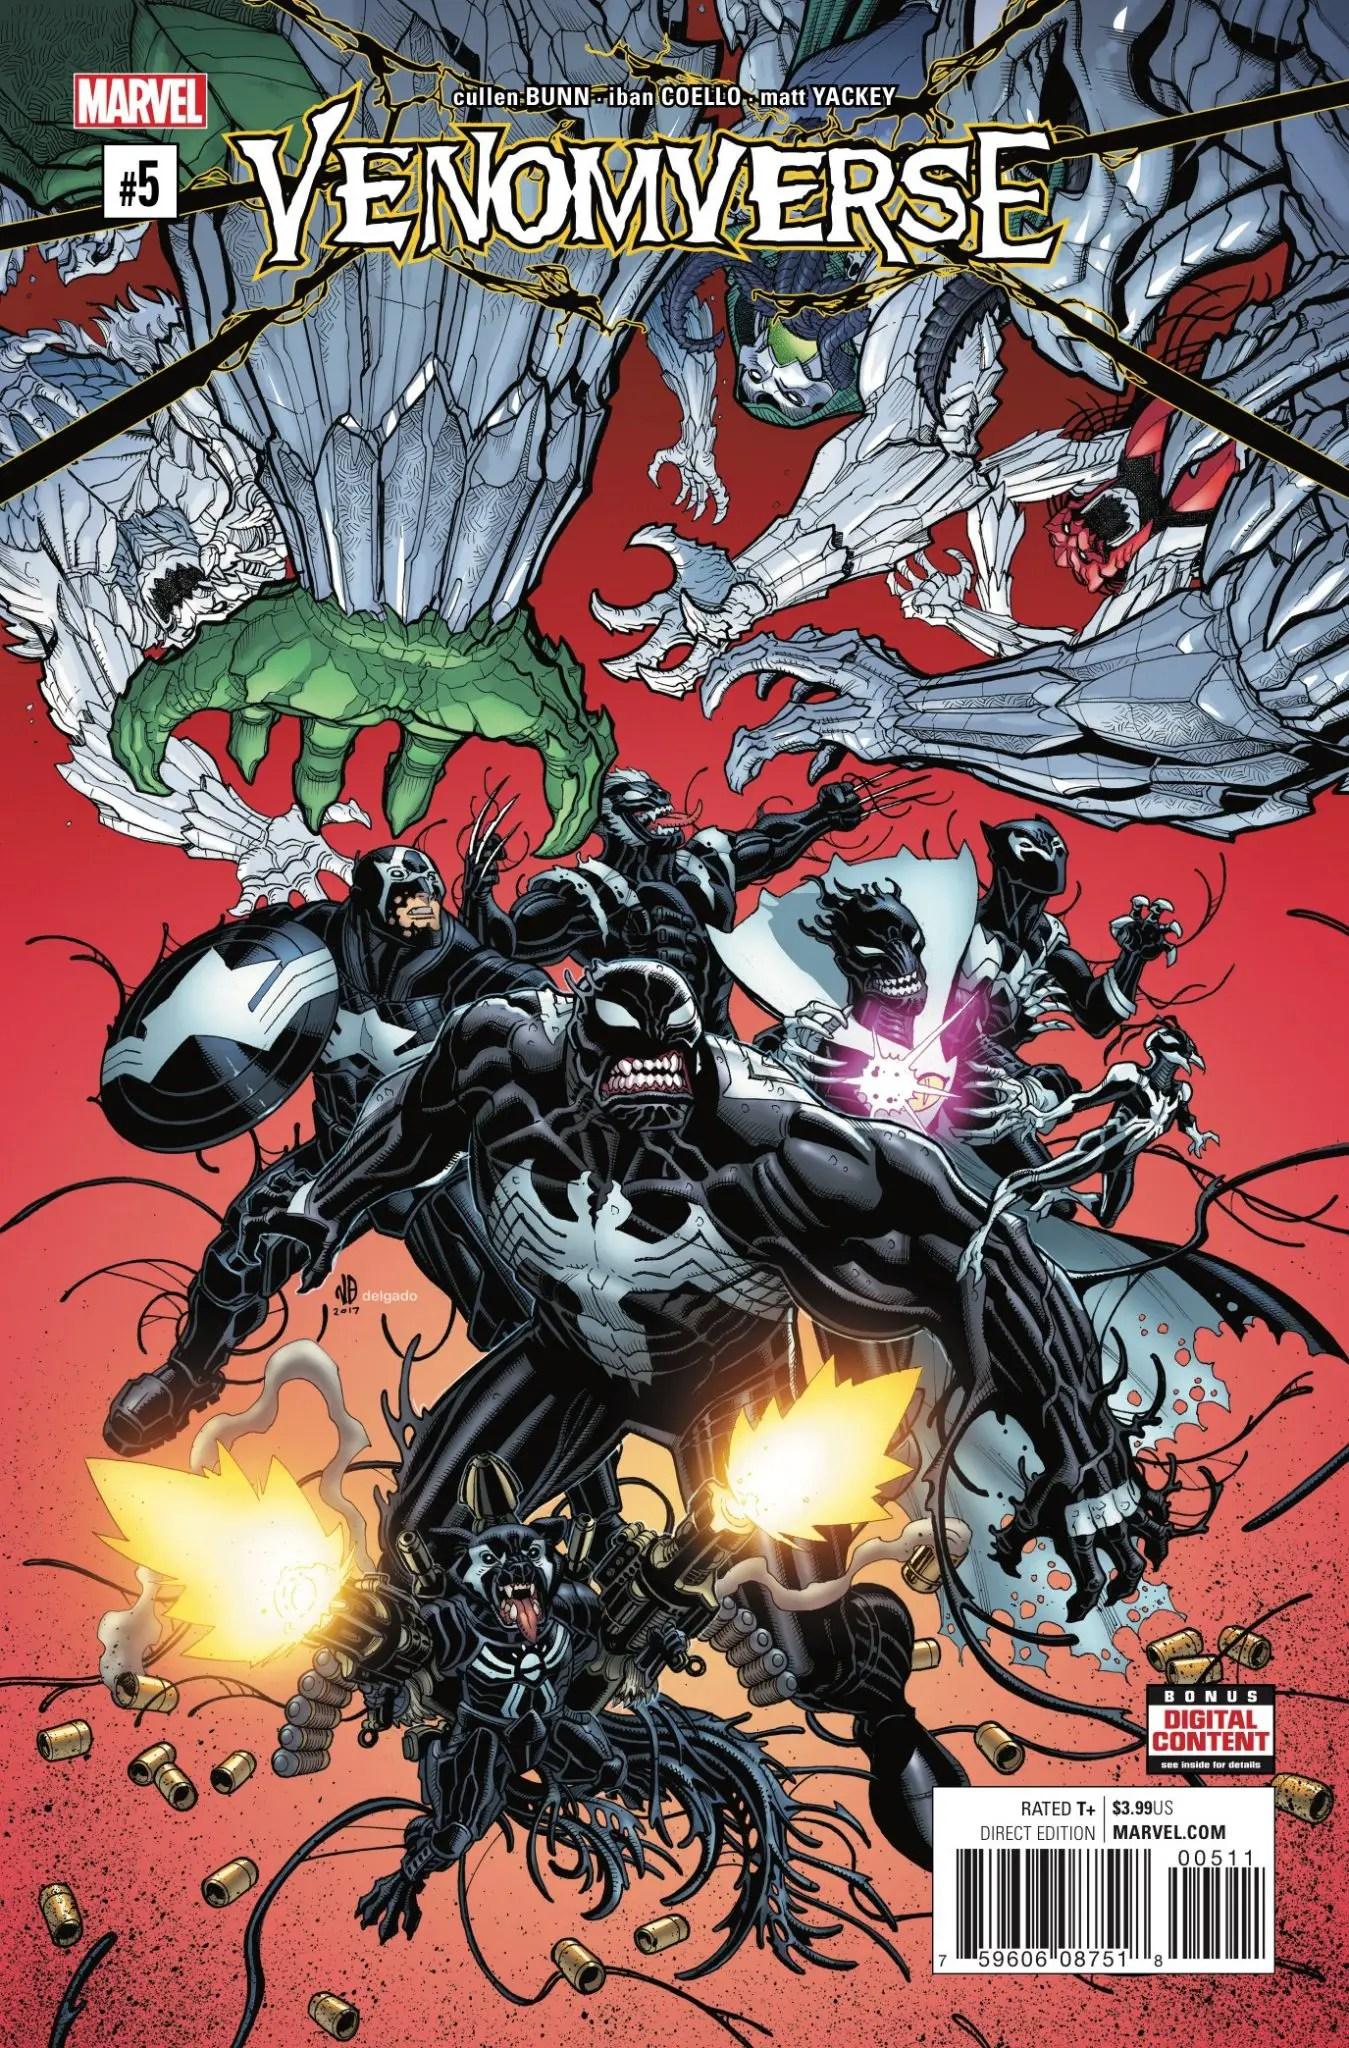 Venomverse #5 Review